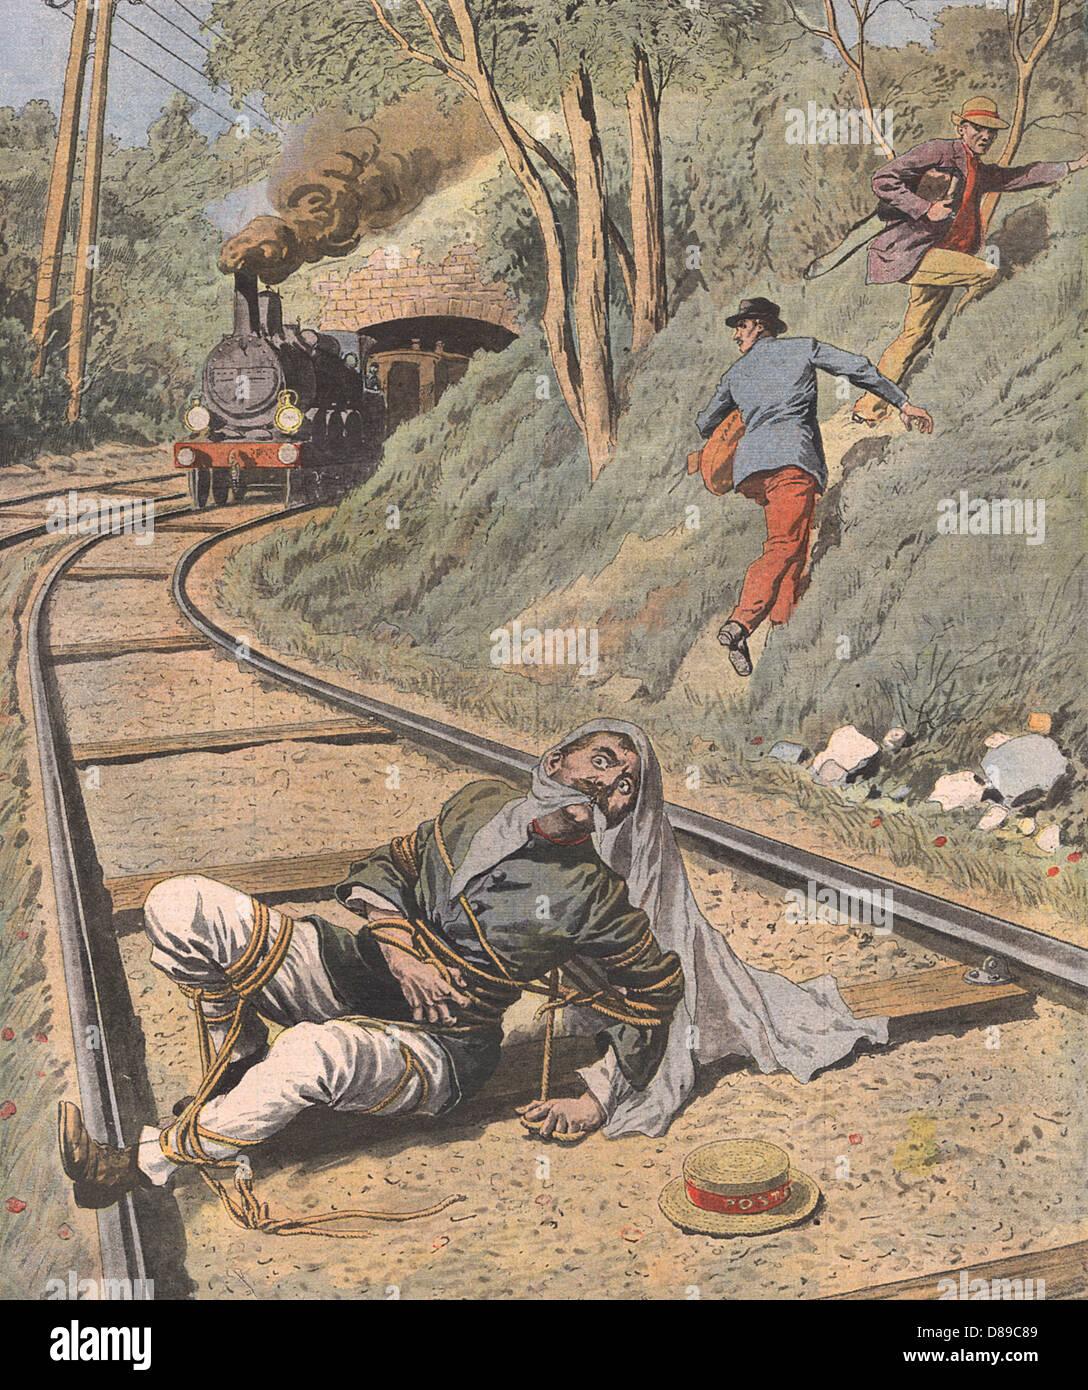 Man On Railway Tracks Stock Photo